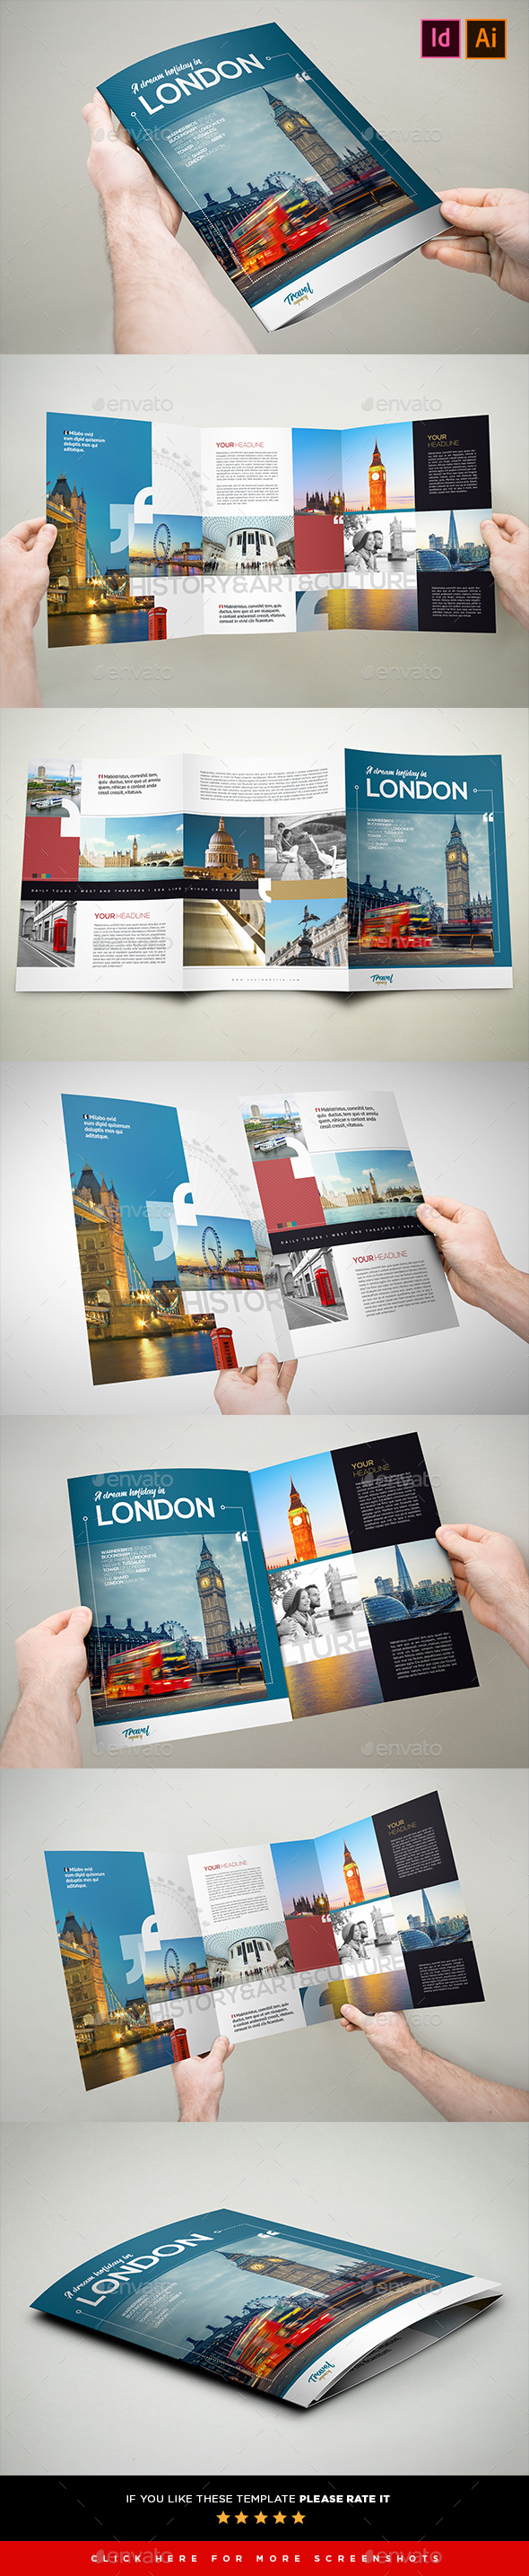 3xA4 Travel & Holiday Brochure - Brochures Print Templates